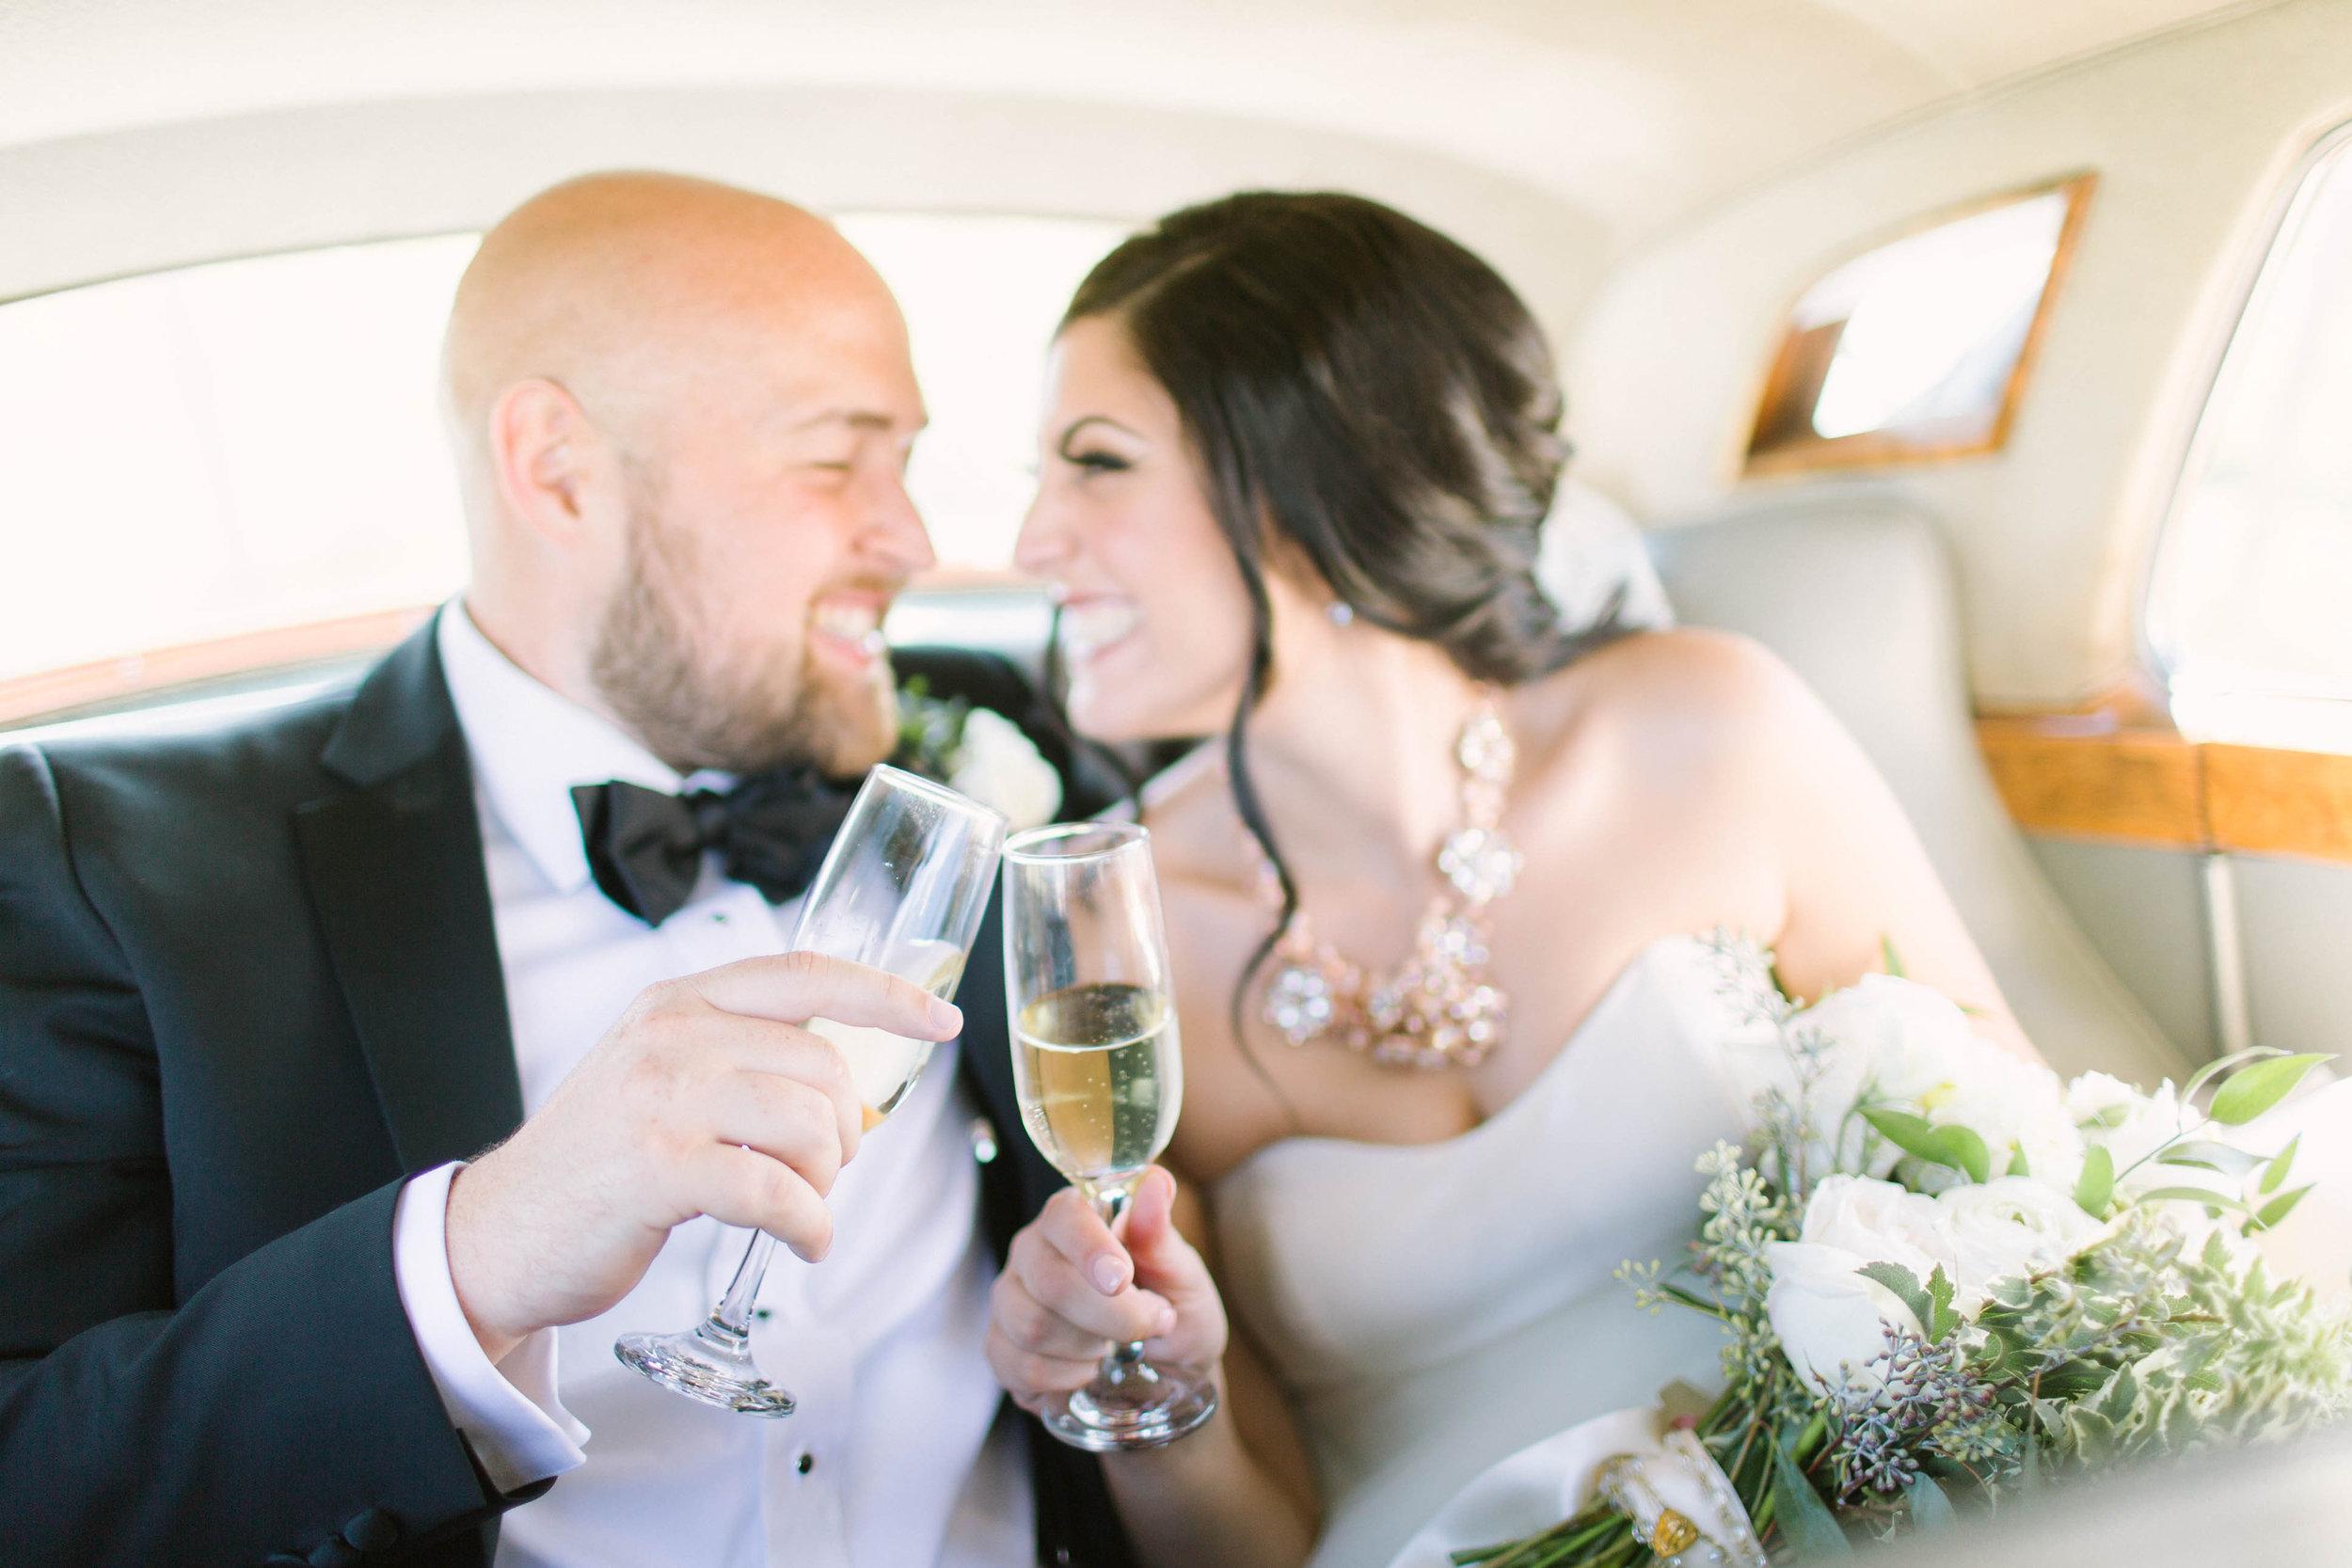 Liuna Gardens Wedding  | As seen on WedLuxe Image by  Elizabeth In Love